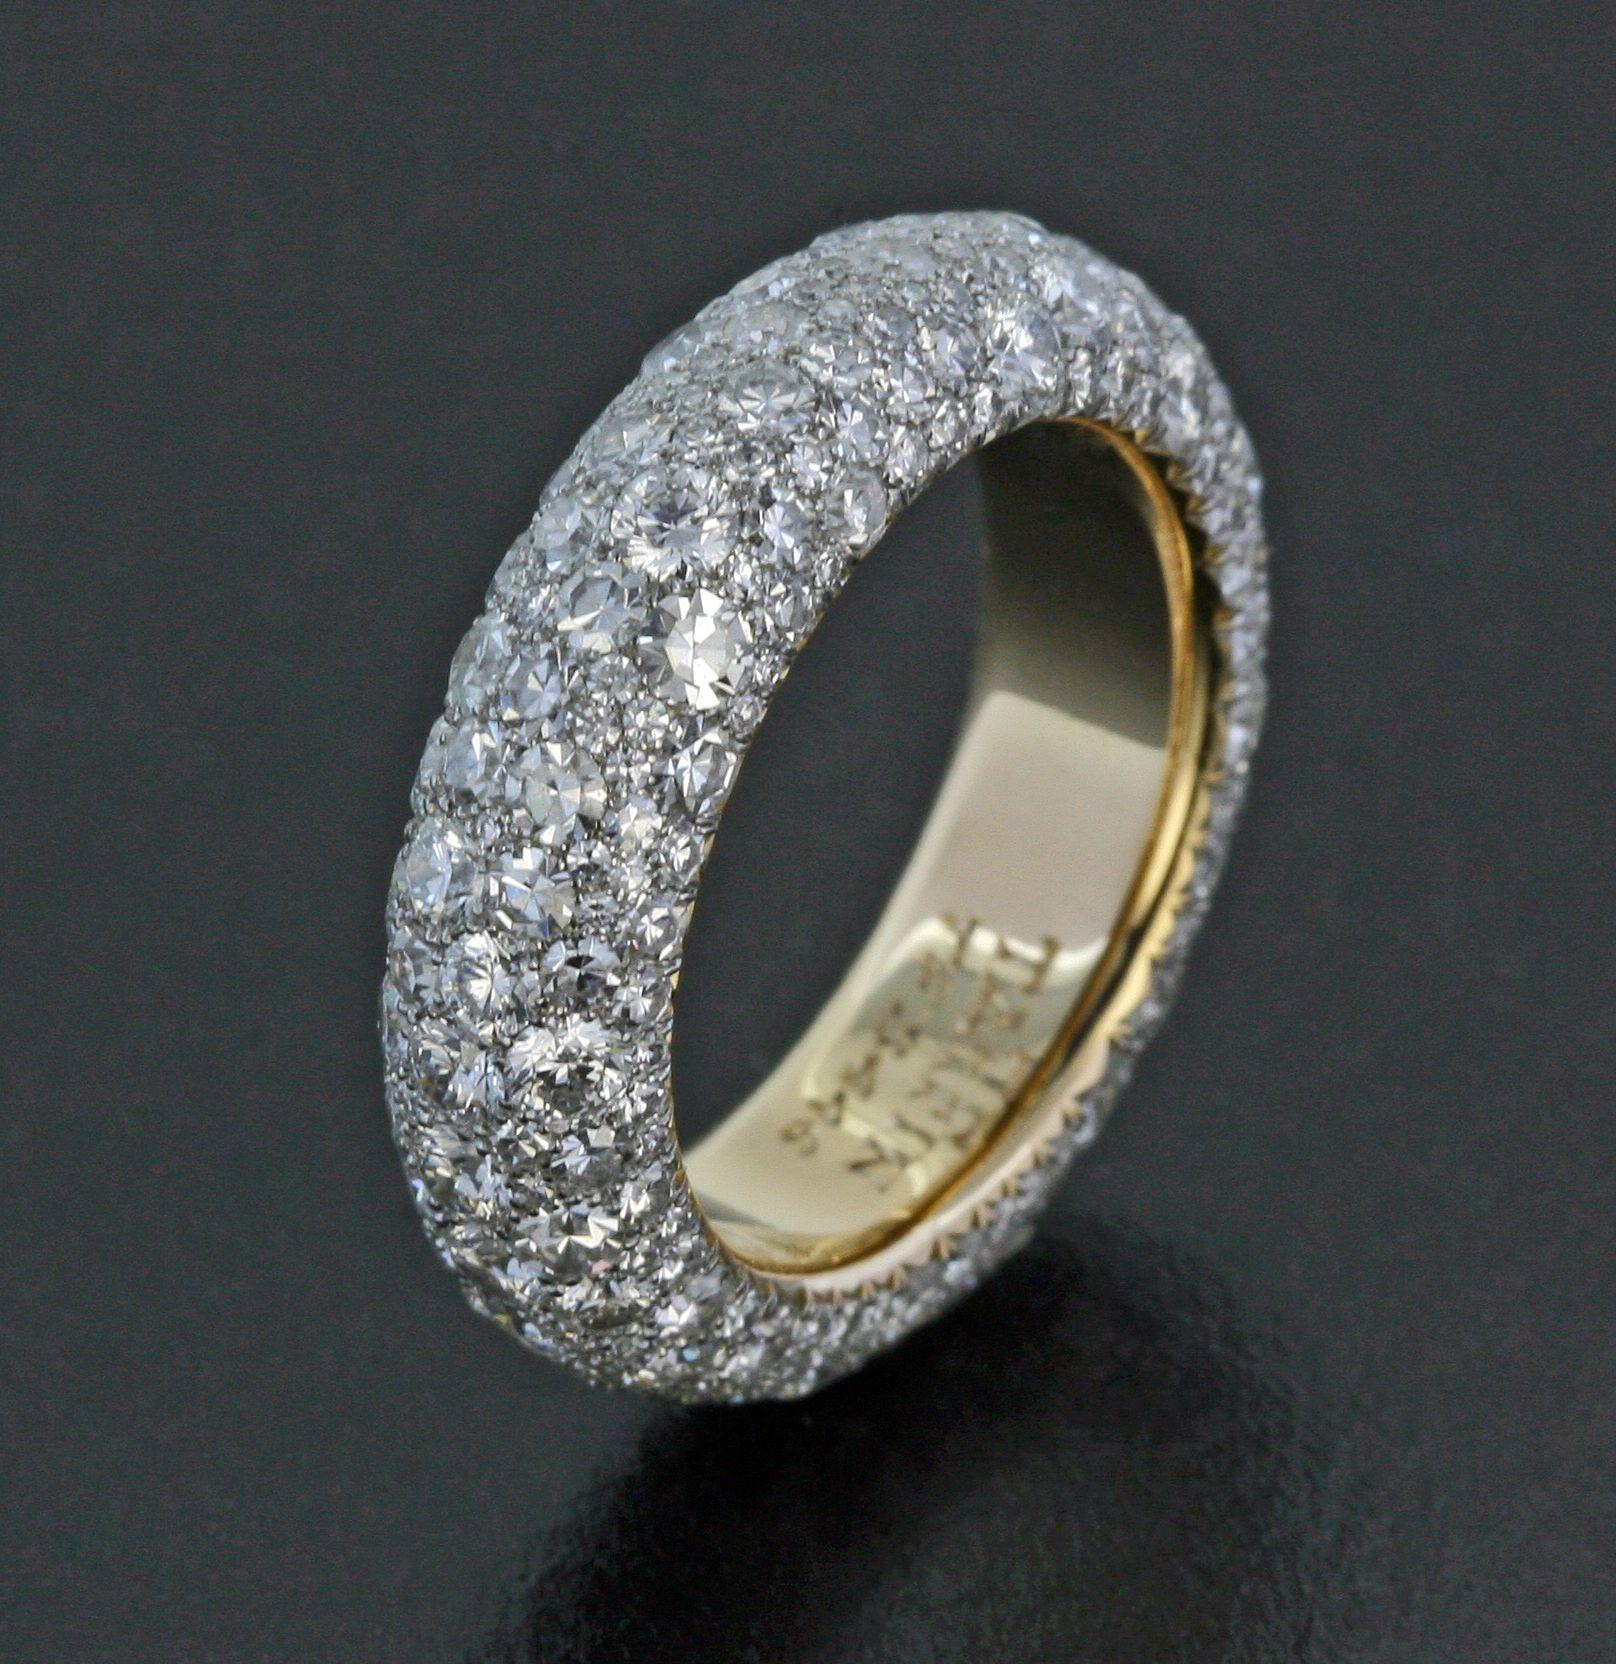 Miadora signature collection 14k white gold 1ct tdw diamond double row - Diamond Platinum And 18k Rose Gold Band By James De Givenchy Taffin Jamesdegivenchy